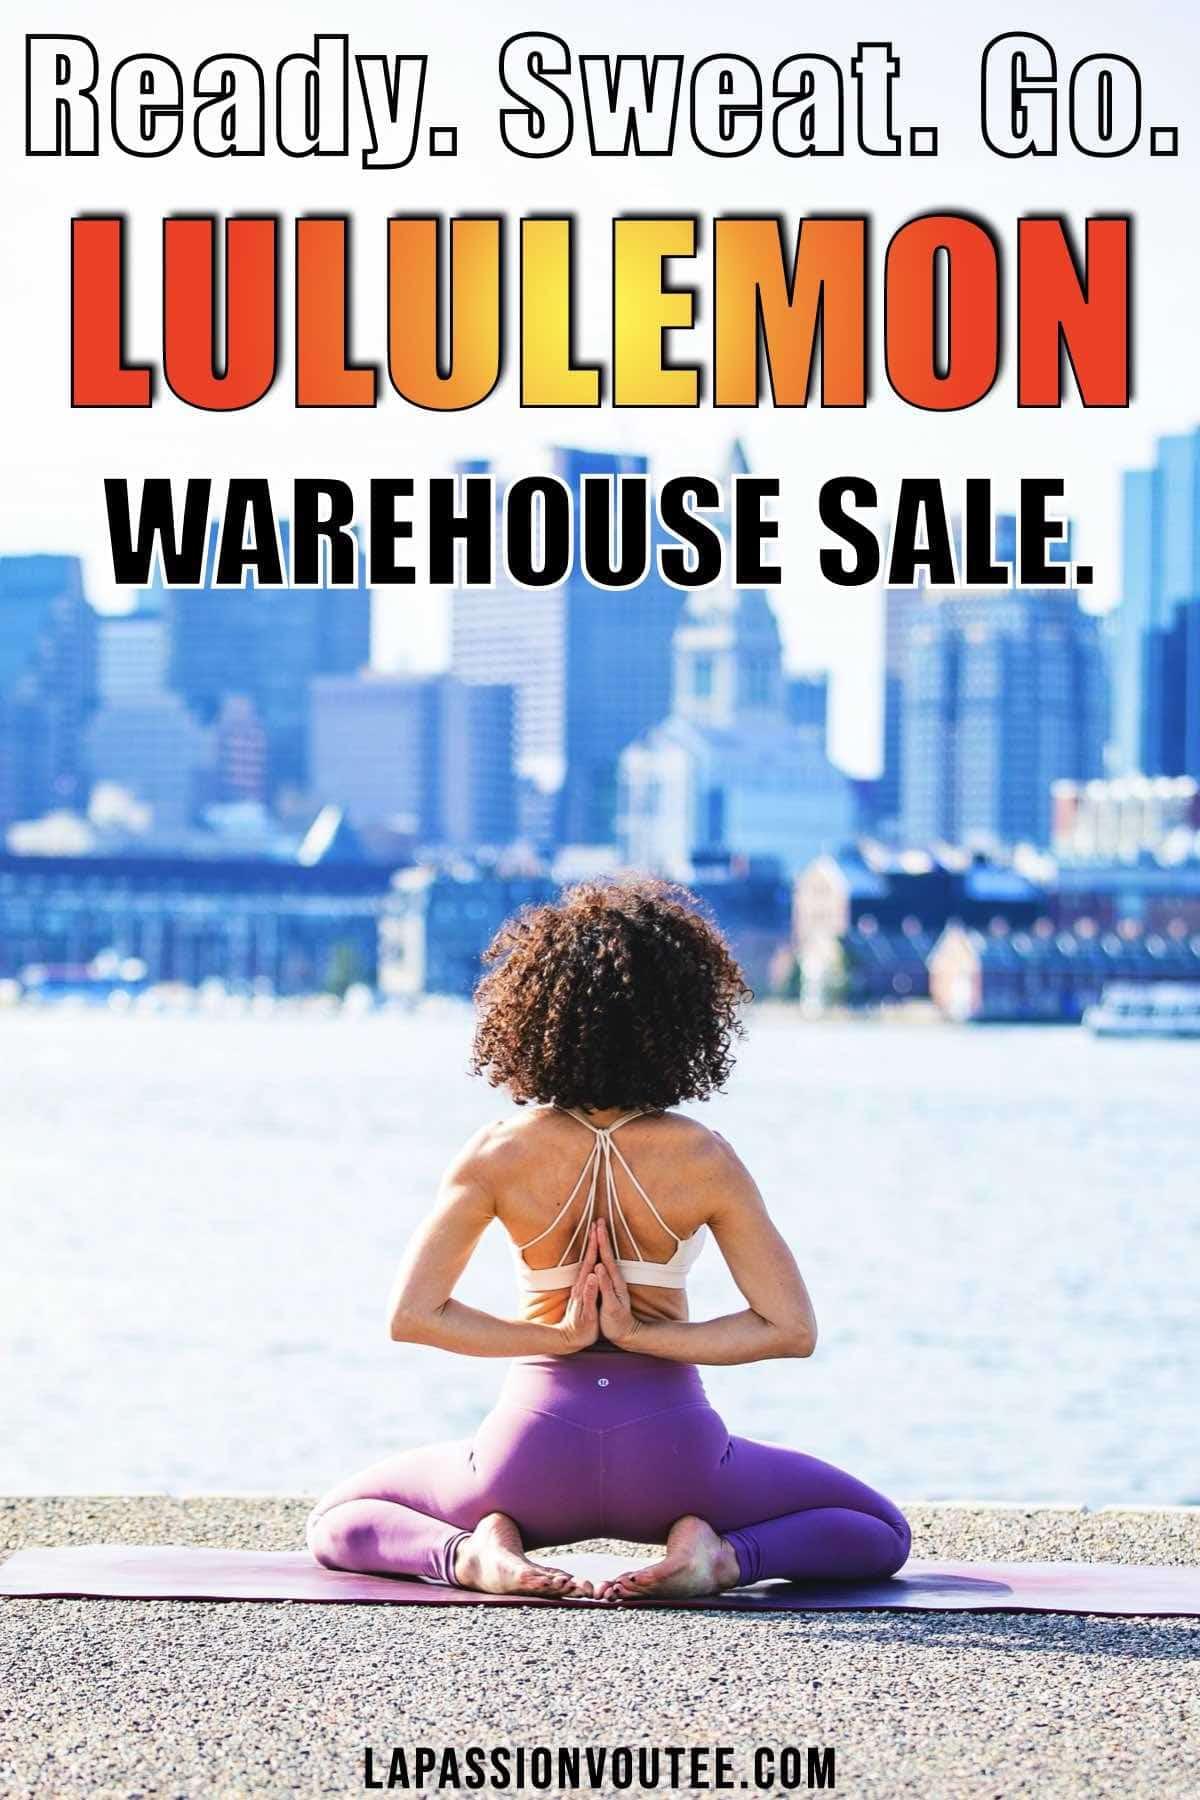 The 2020 Lululemon sale is on right now. Shop over 800 Lululemon clothing at an insane deep for 5 days only. Lululemon summer sale - Lululemon Black Friday in July sale.